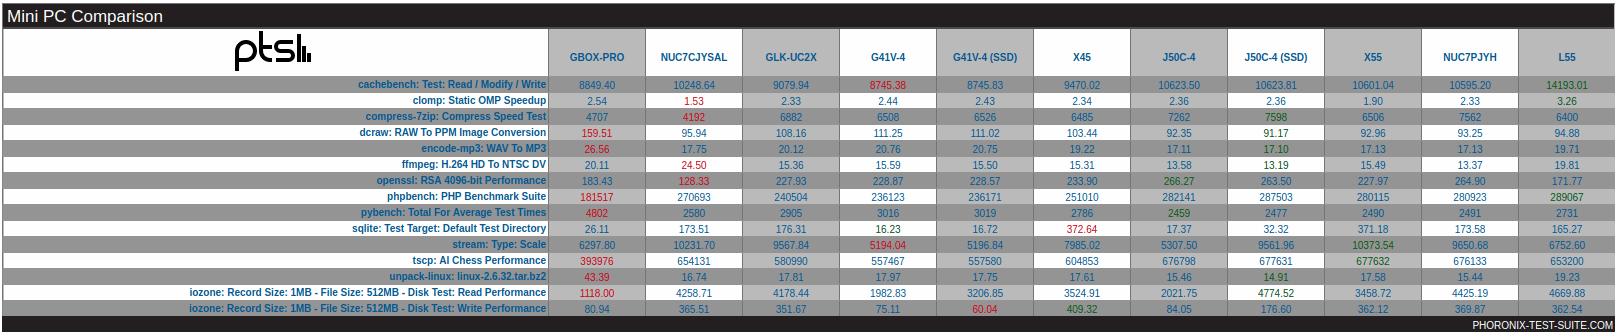 minipc-g41v-4-j50c-4-ssd-linux-benchmarks-results-overview